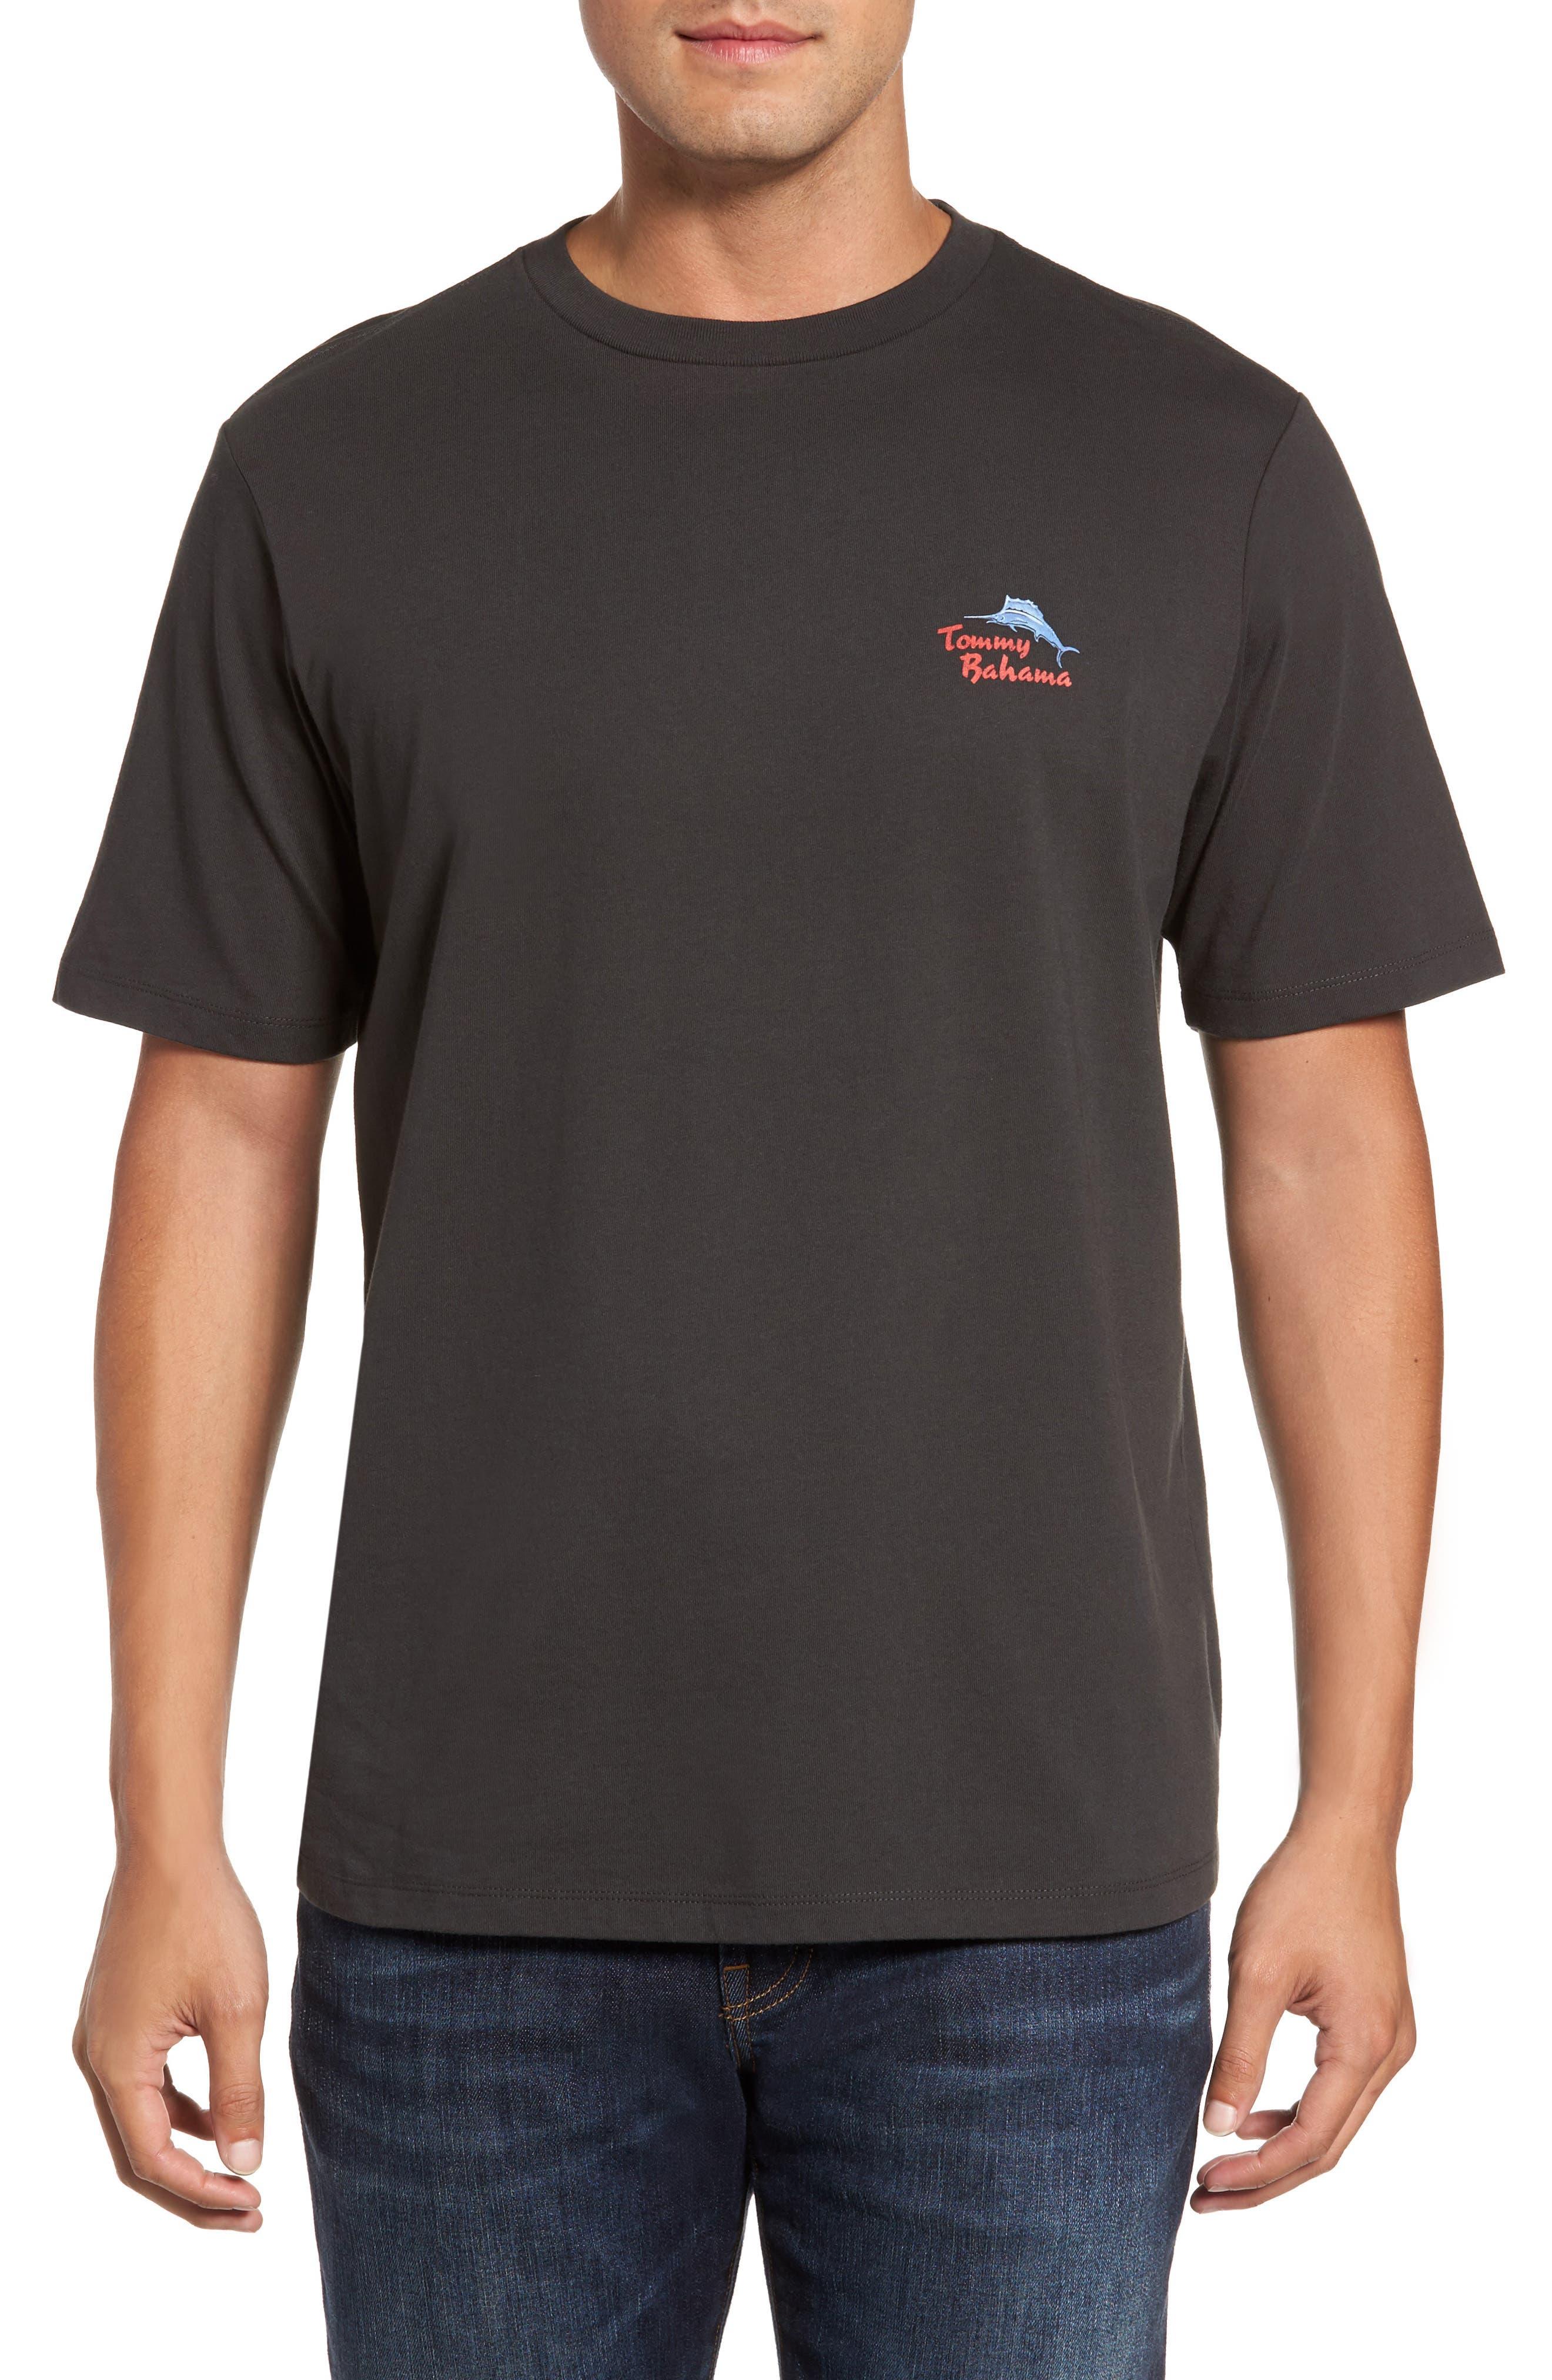 Gulp Fiction T-Shirt,                             Main thumbnail 1, color,                             001